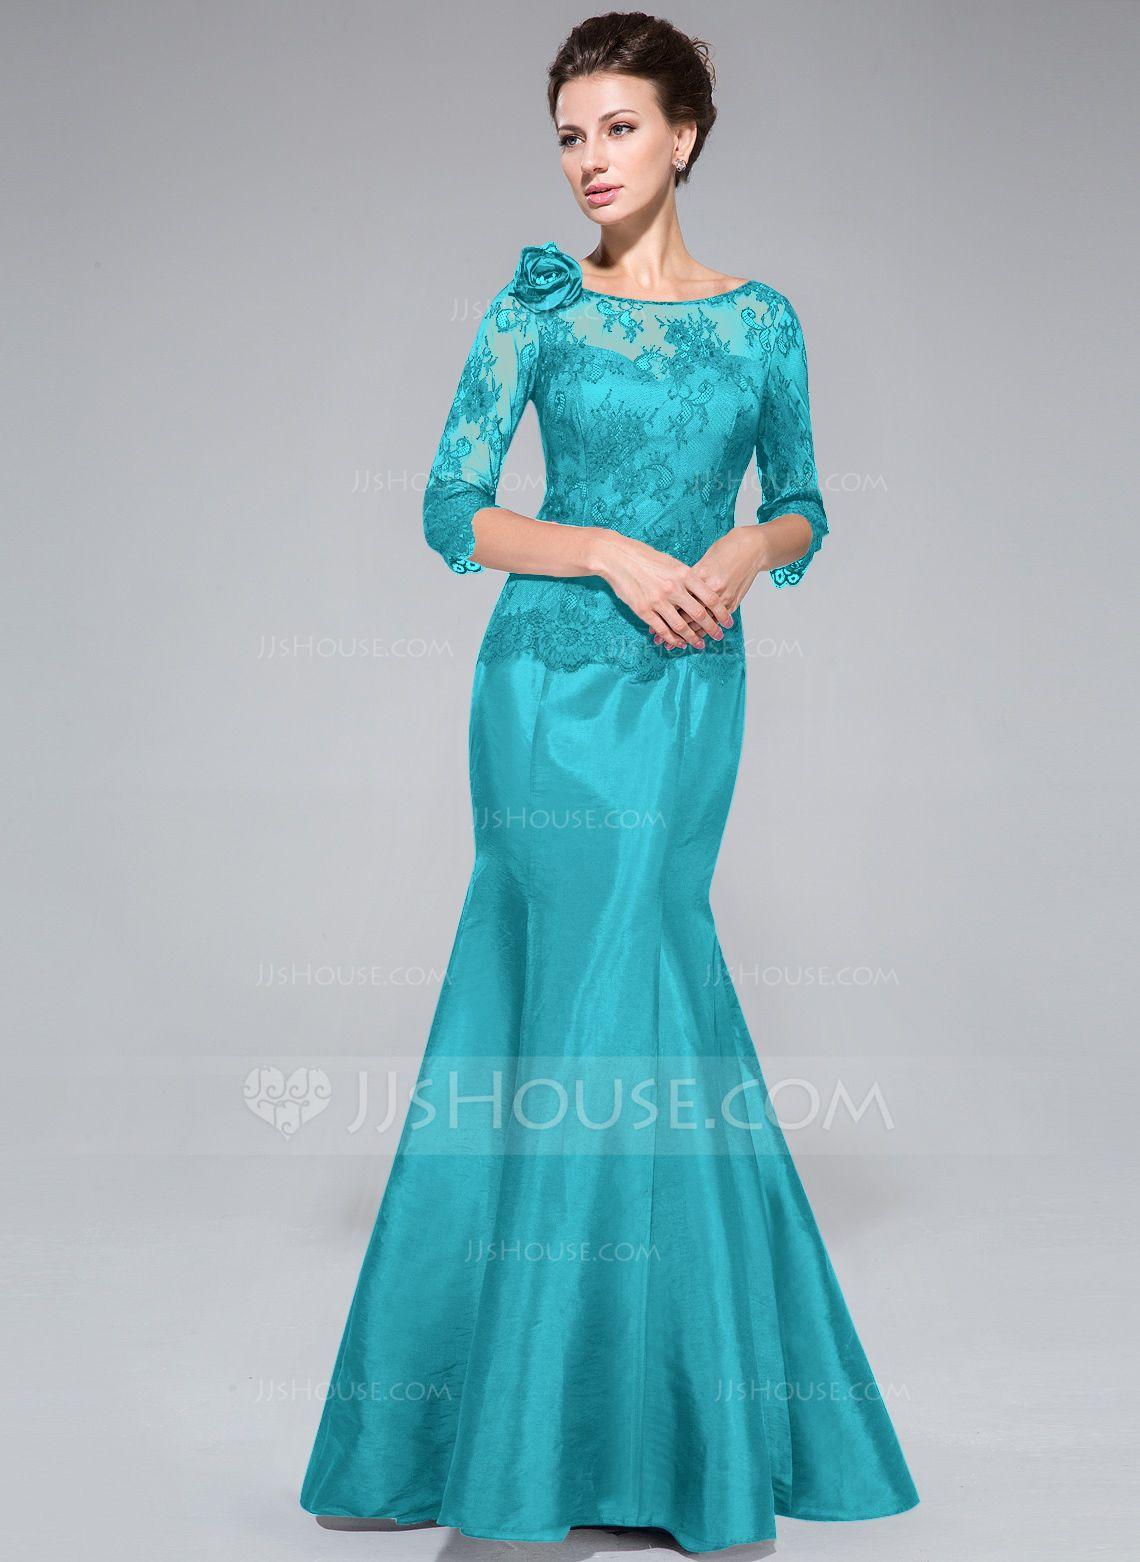 Beautiful Jjshouse Wedding Dresses Ideas - All Wedding Dresses ...